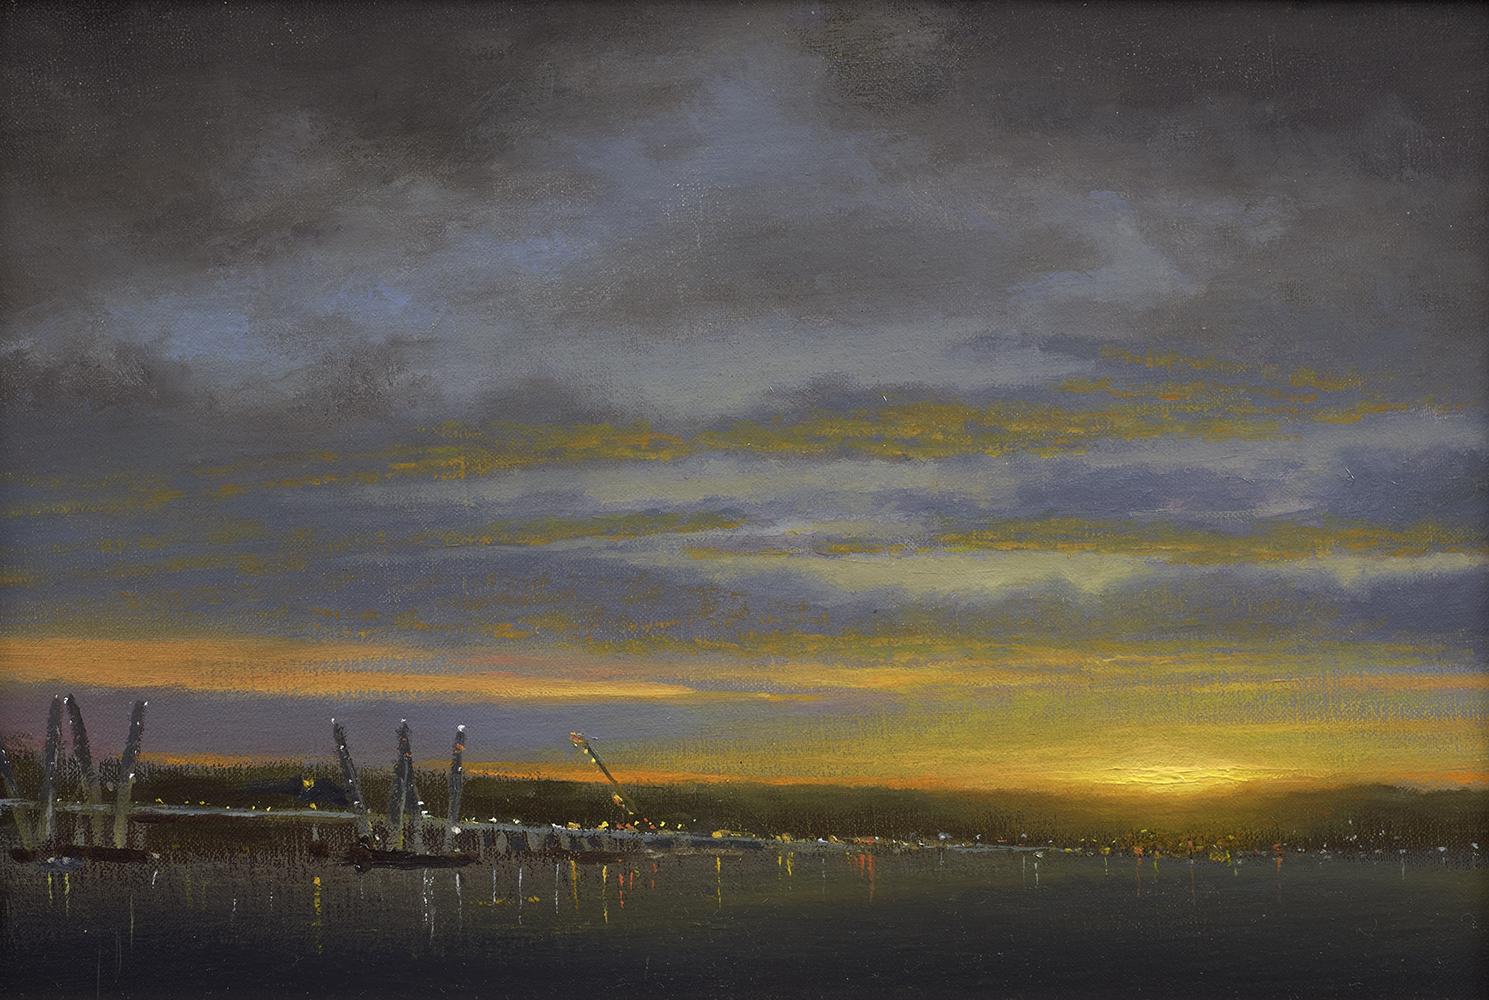 ken_salaz_kws1100_sunset_over_new_bridge_construction_tarrytown.jpg